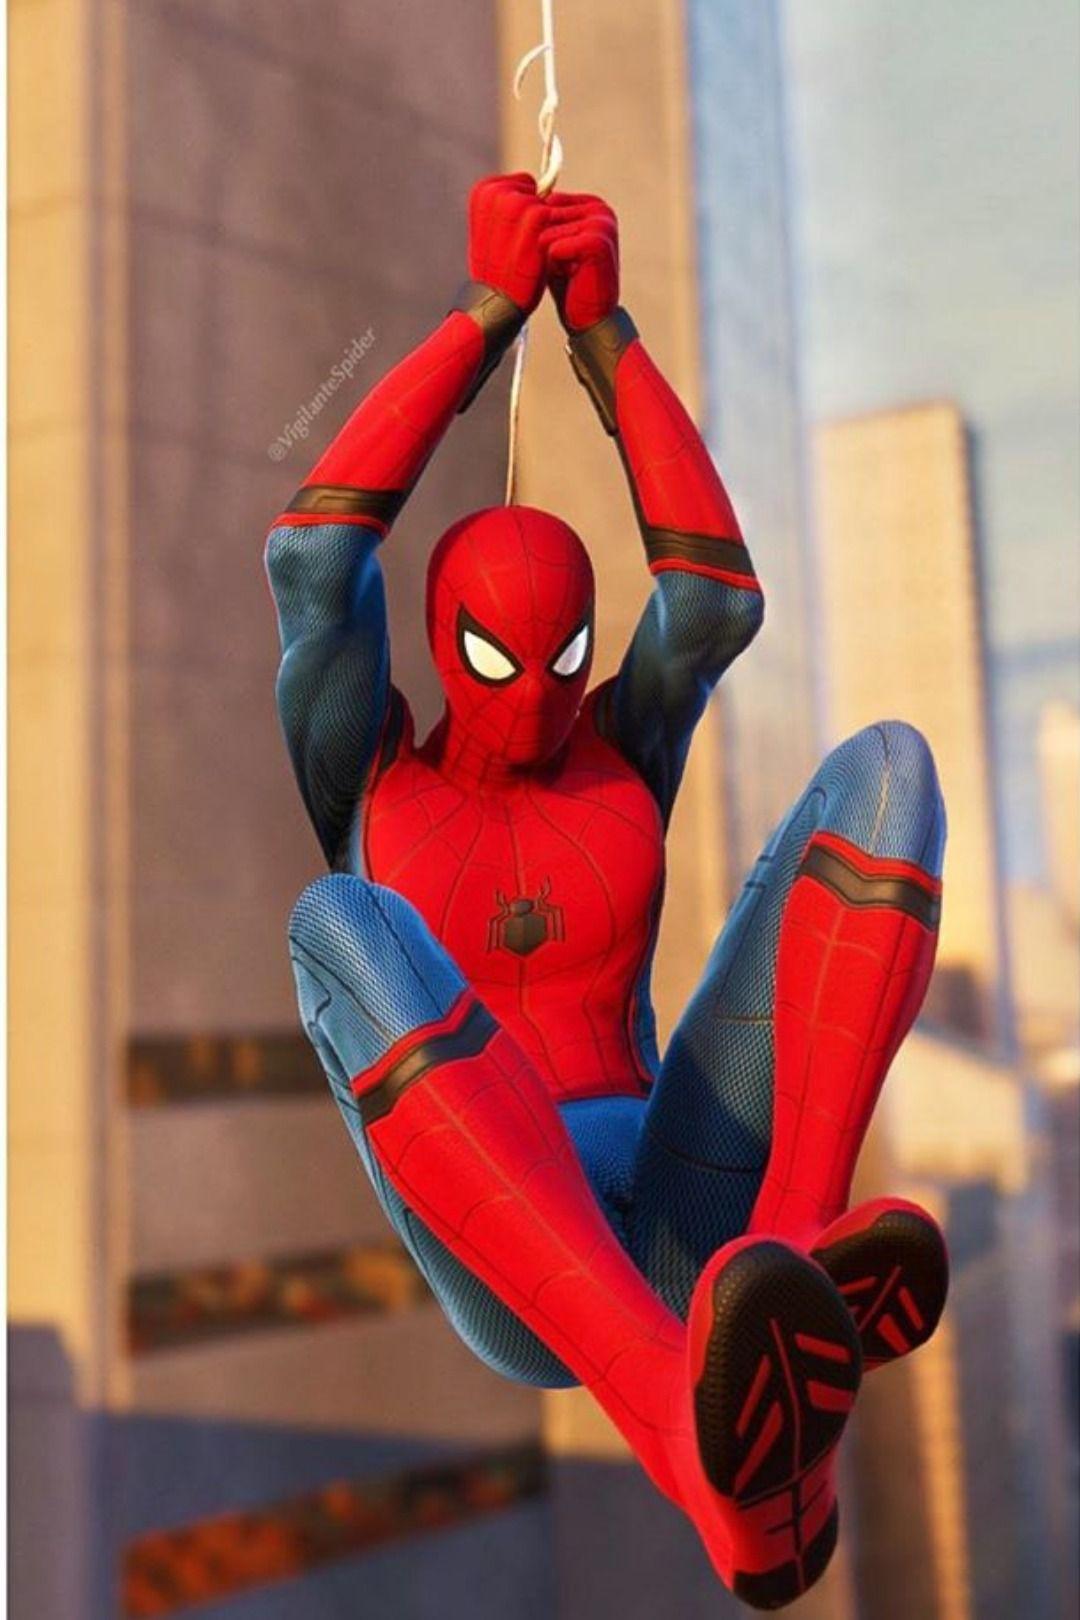 The Best Spiderman Wallpaper for your Smartphone Taken